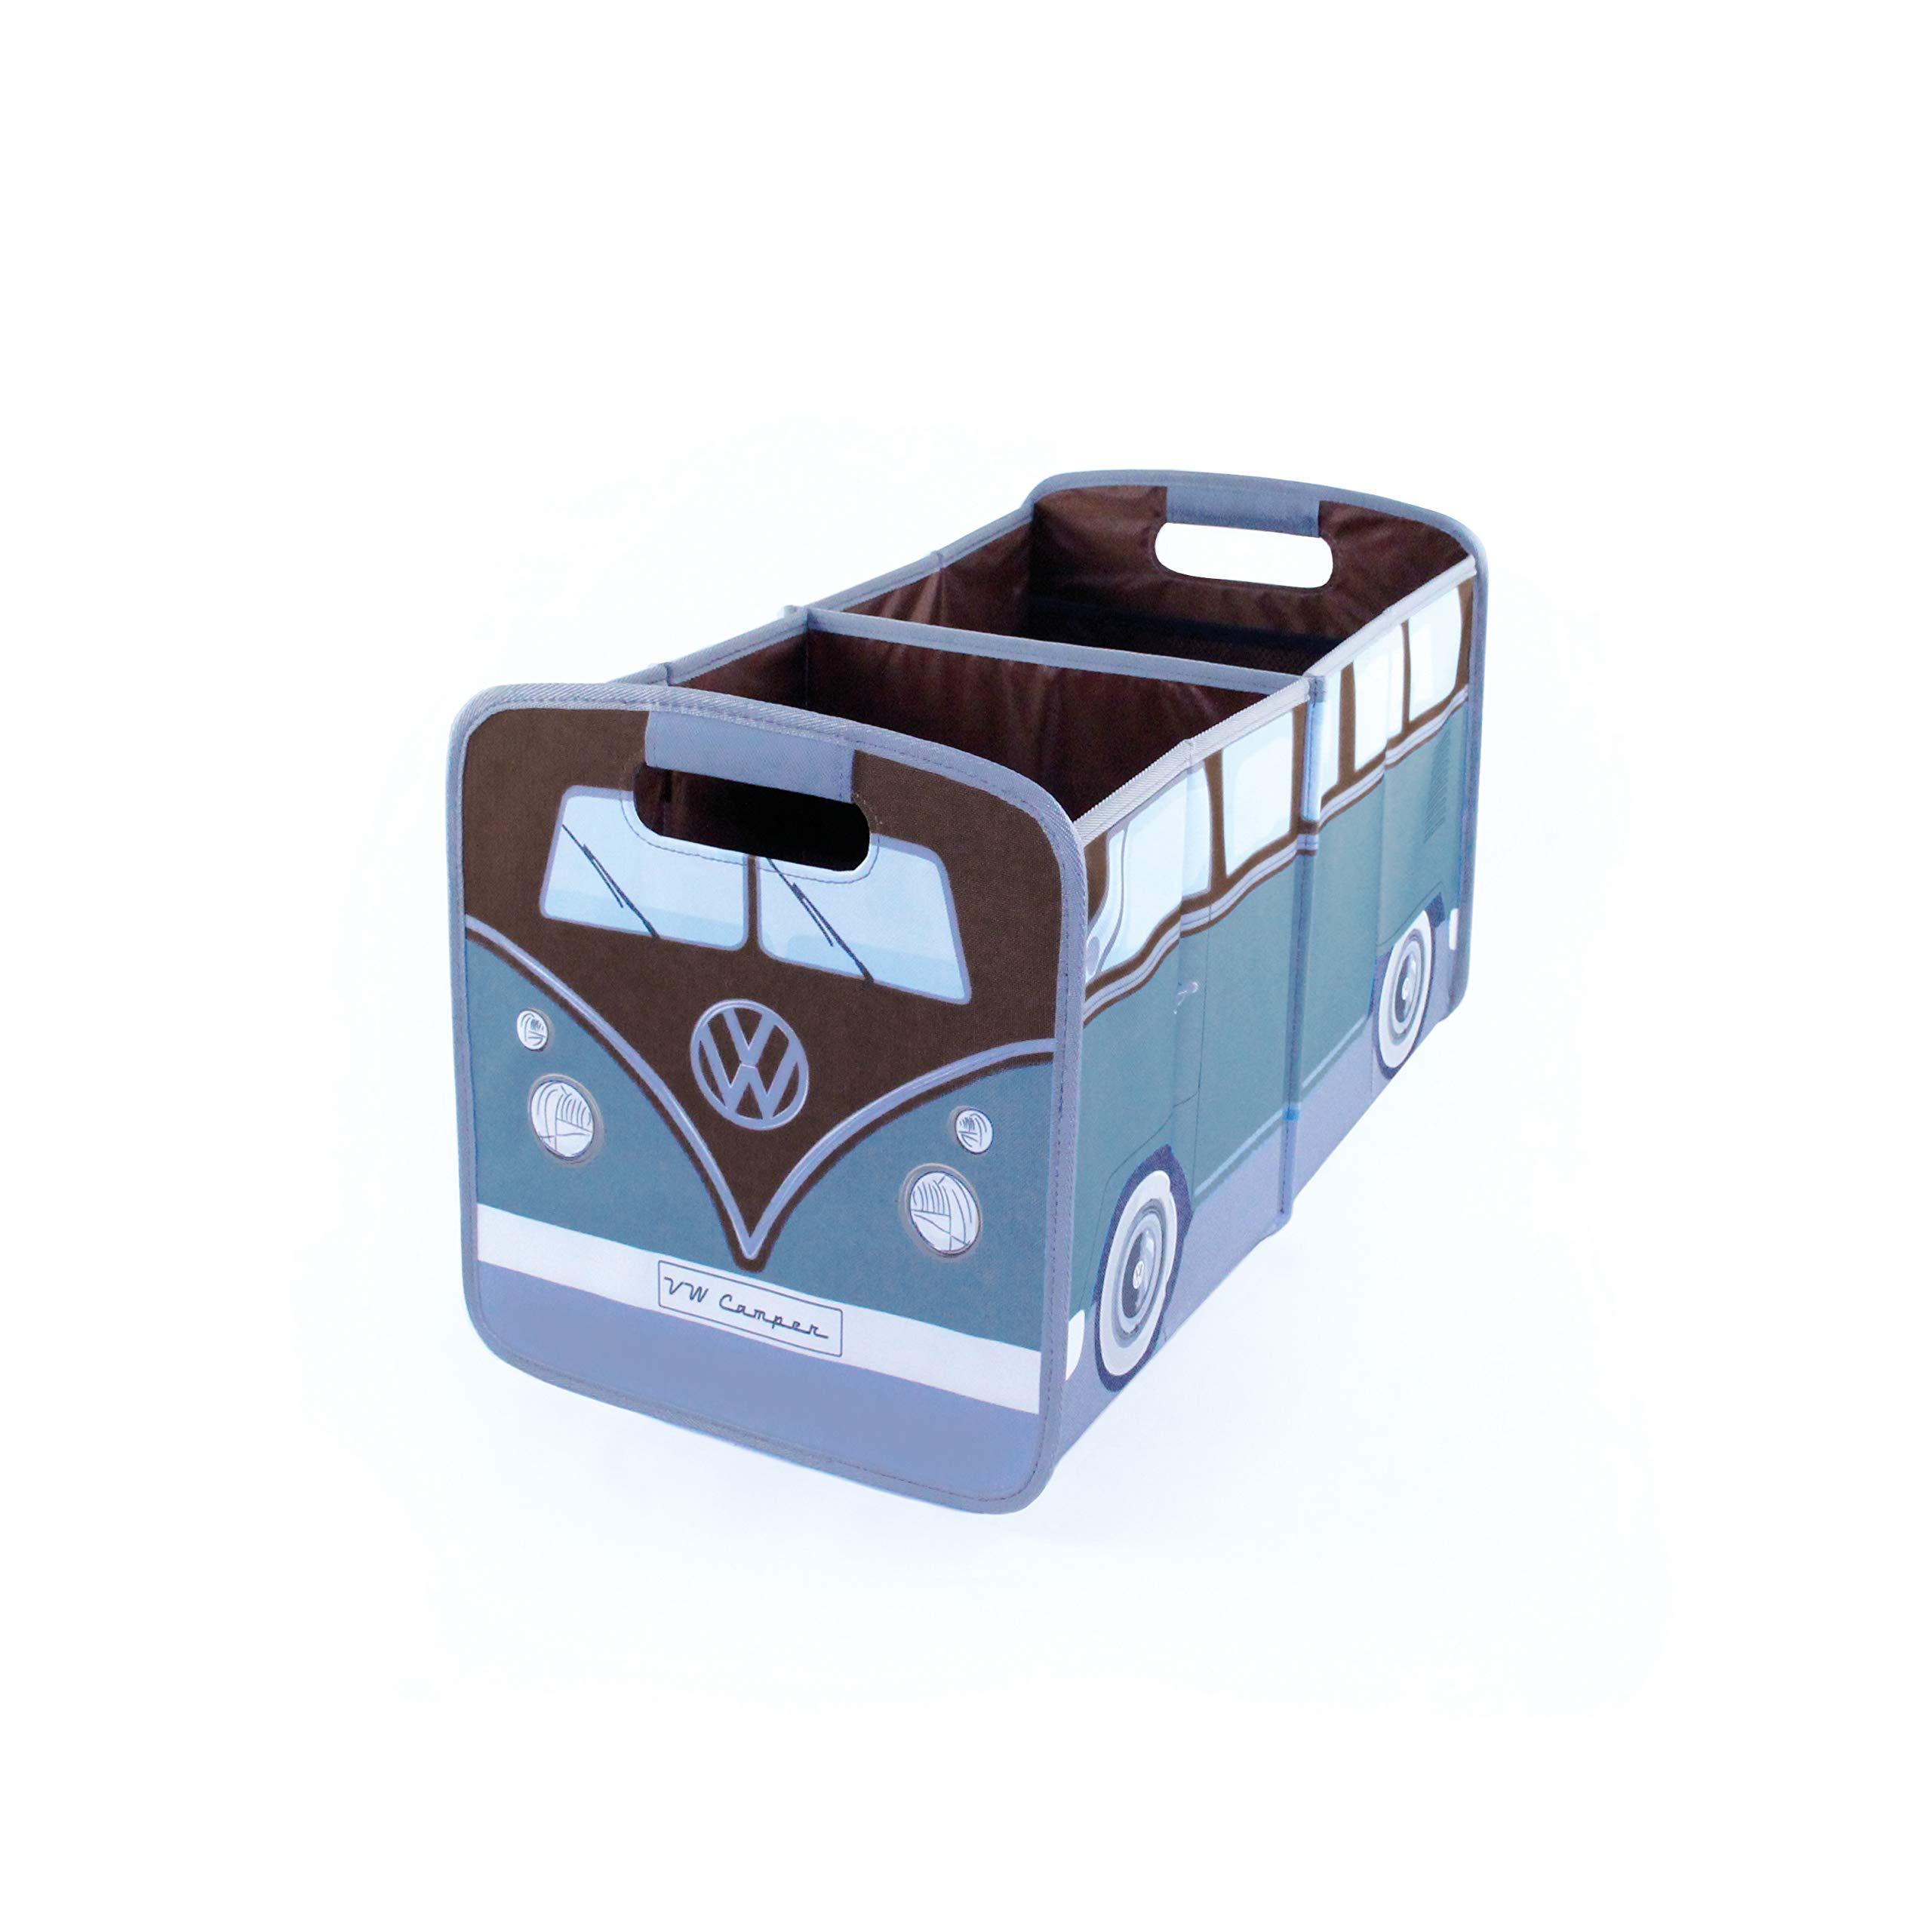 BRISA VW Collection VW T1 Bus Foldable Storage Box - Petrol/Brown